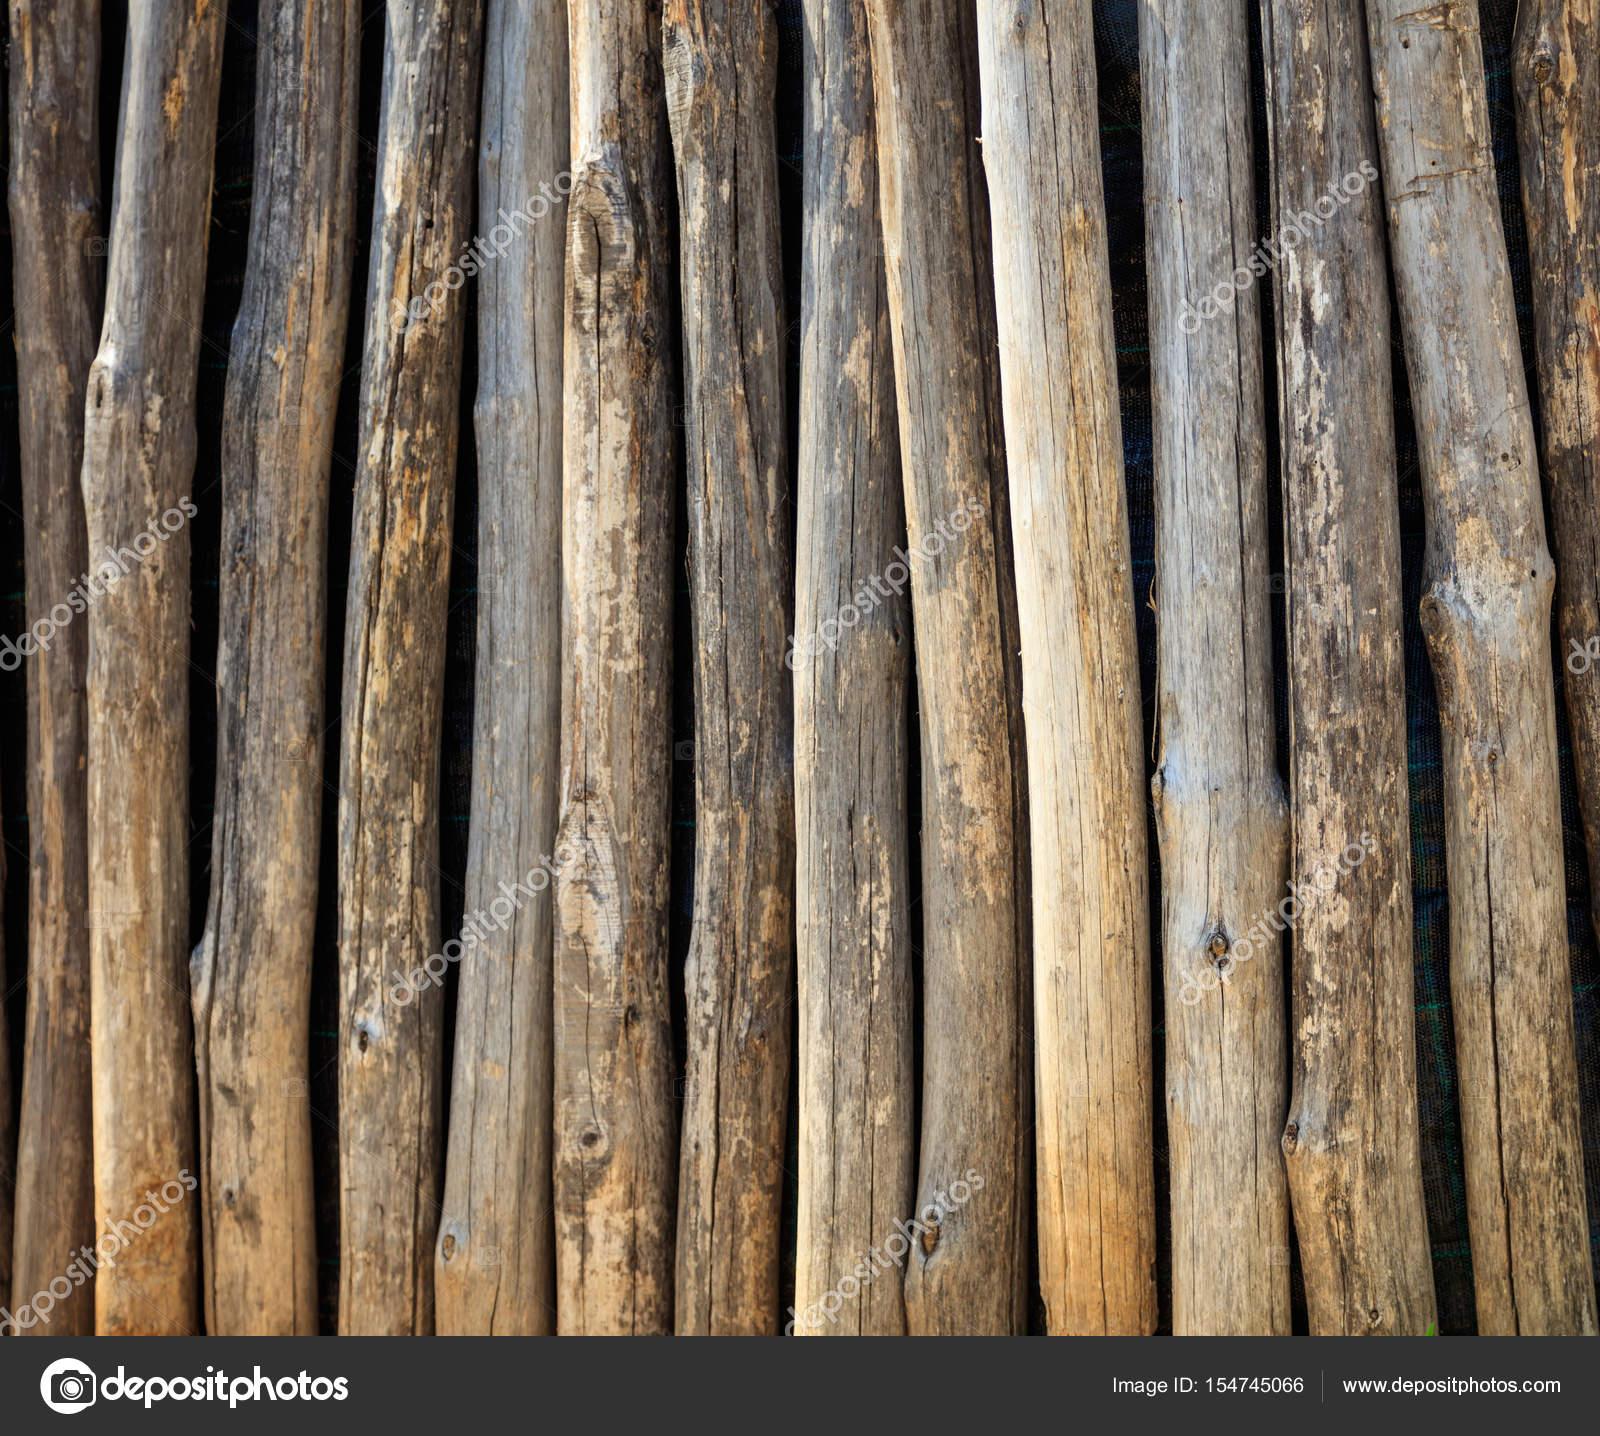 Zaun Aus Holz Baumstamme Stockfoto C Viperagp 154745066